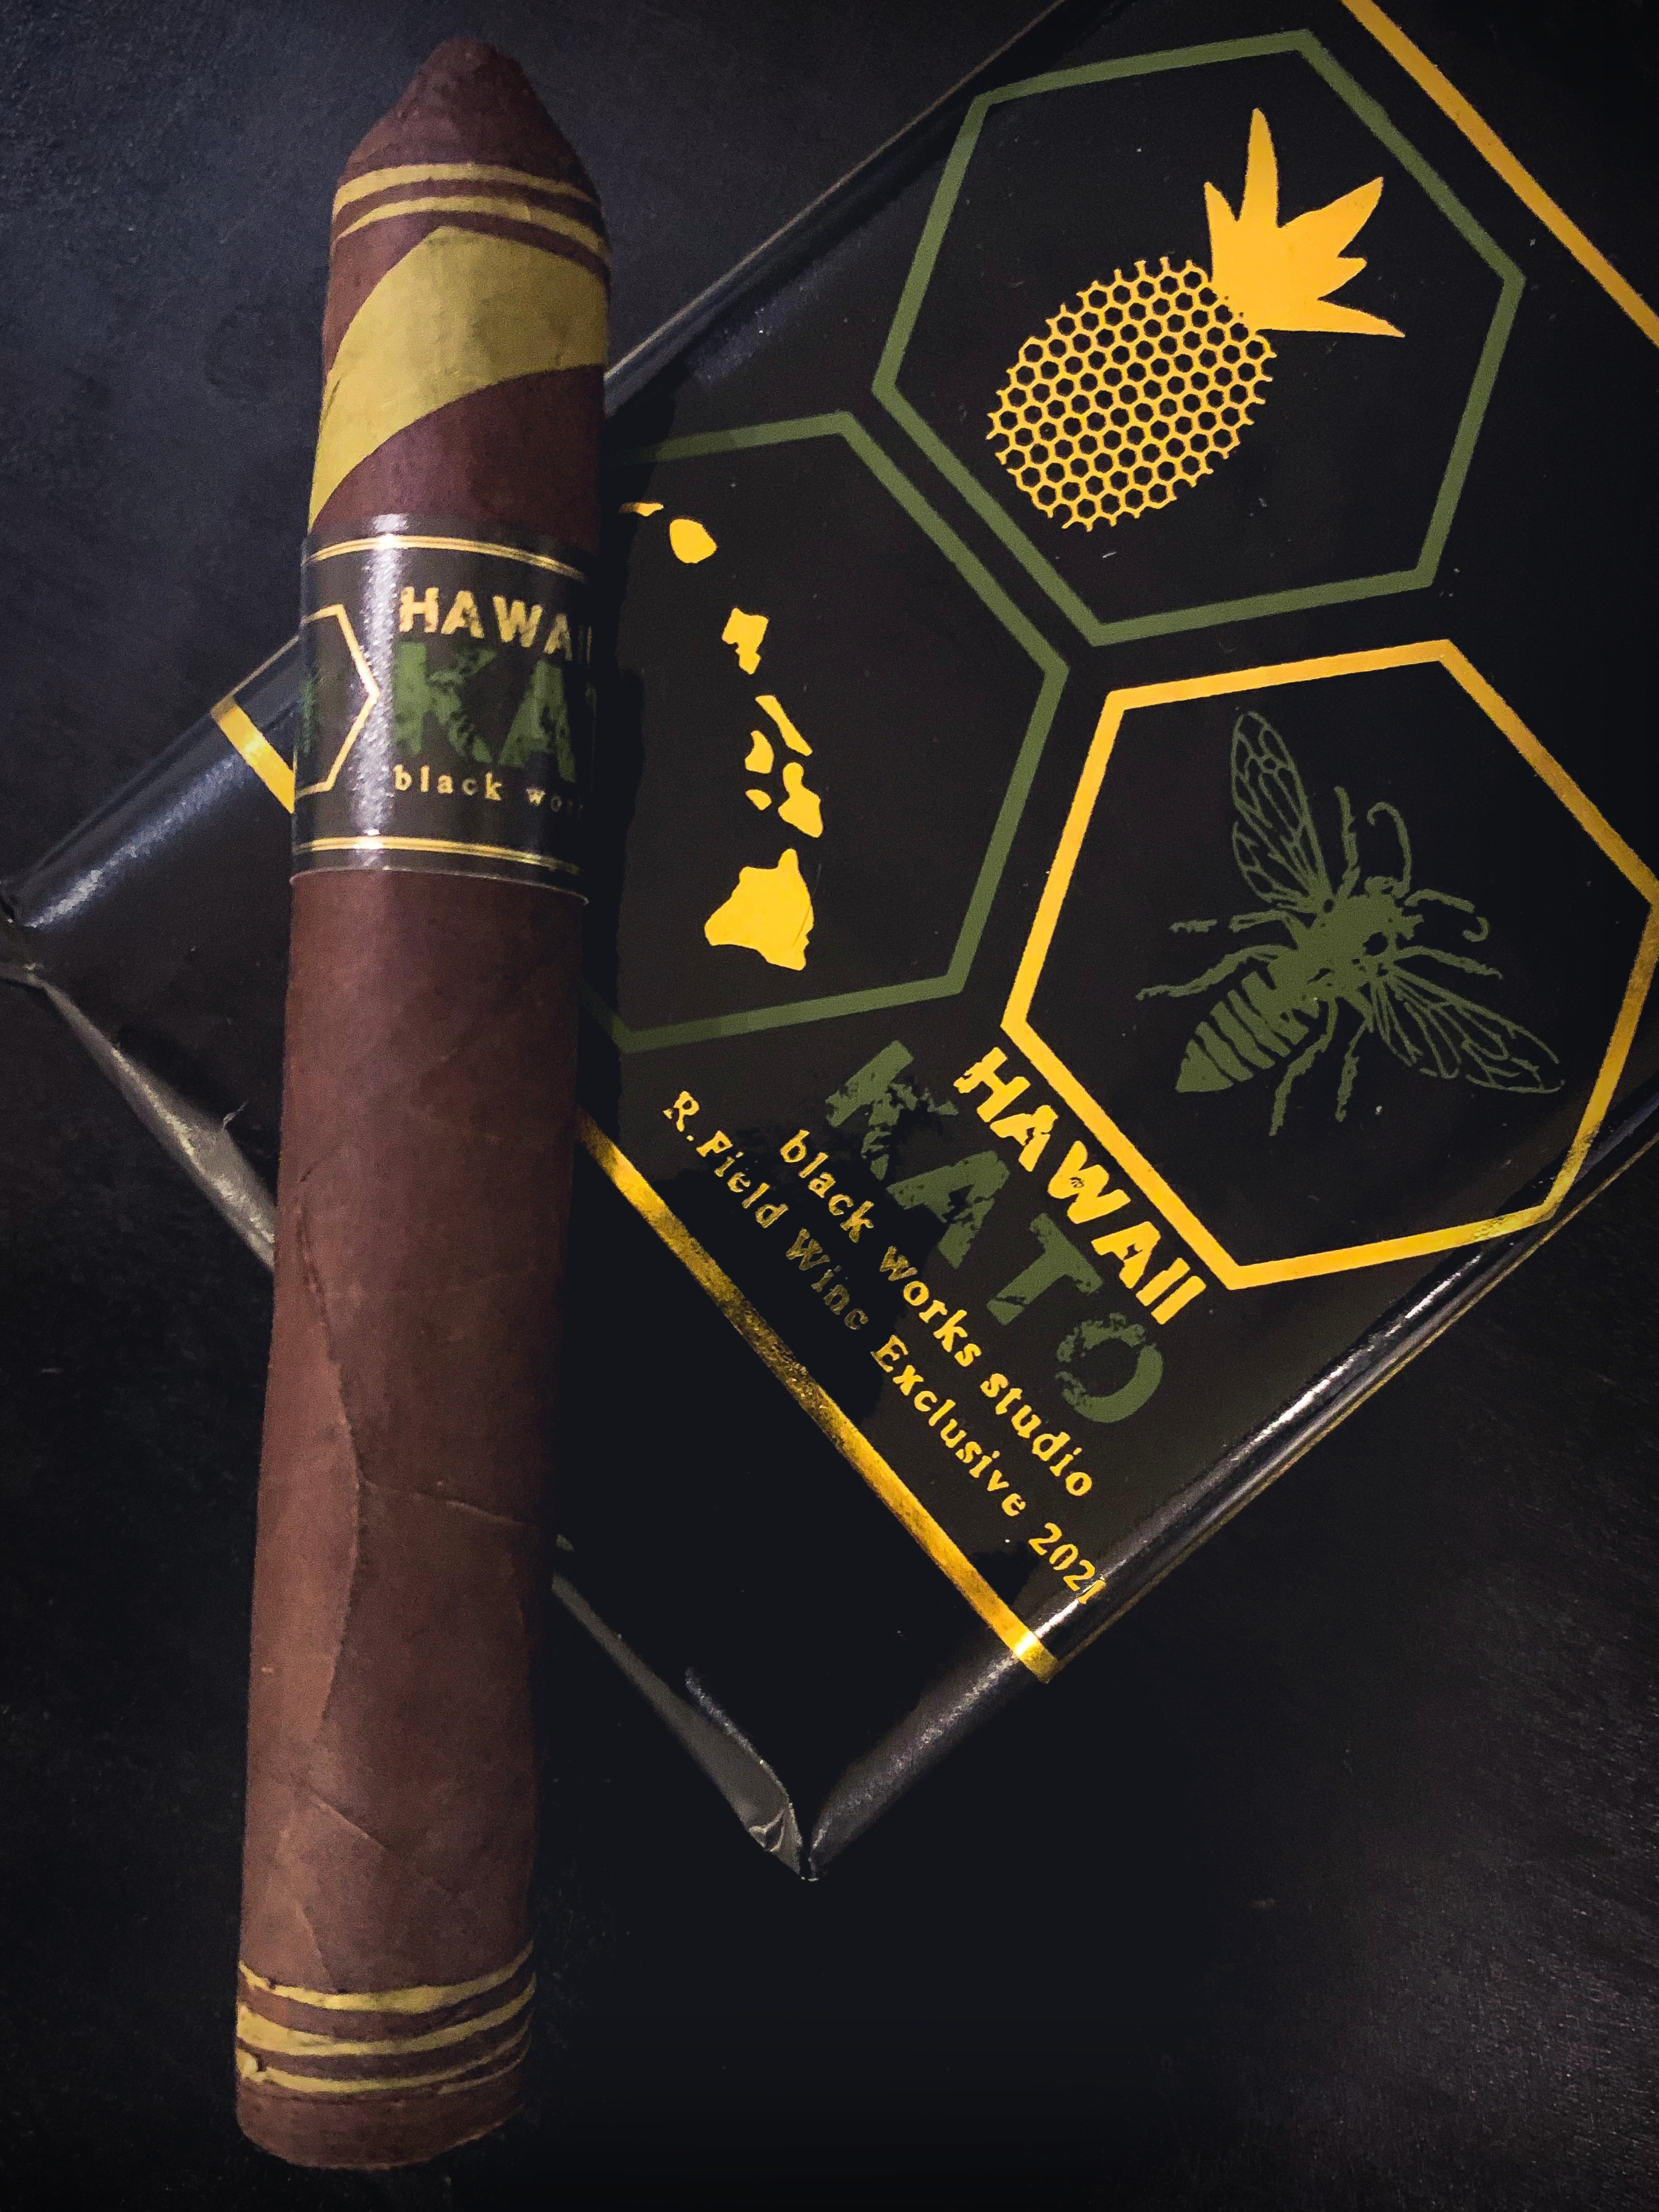 Black Label Trading Company Announces Hawaii KATO for R. Field Wine Co. - Cigar News